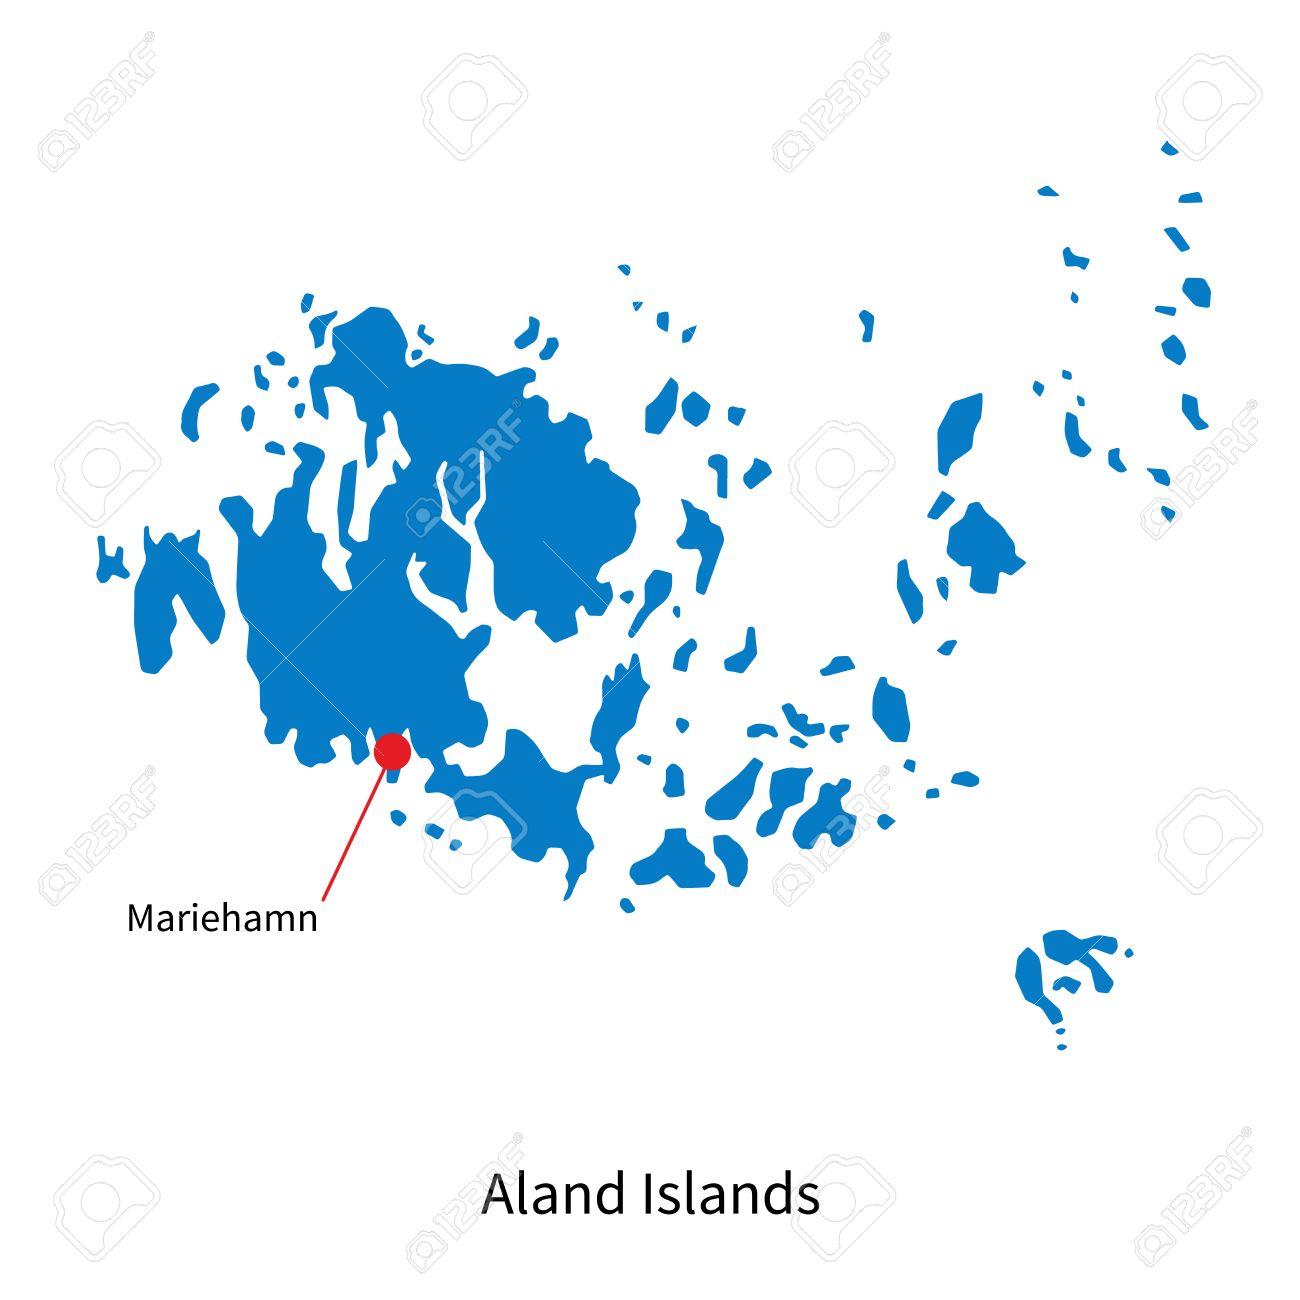 Detailed Vector Map Of Aland Islands And Capital City Mariehamn - Aland islands world map